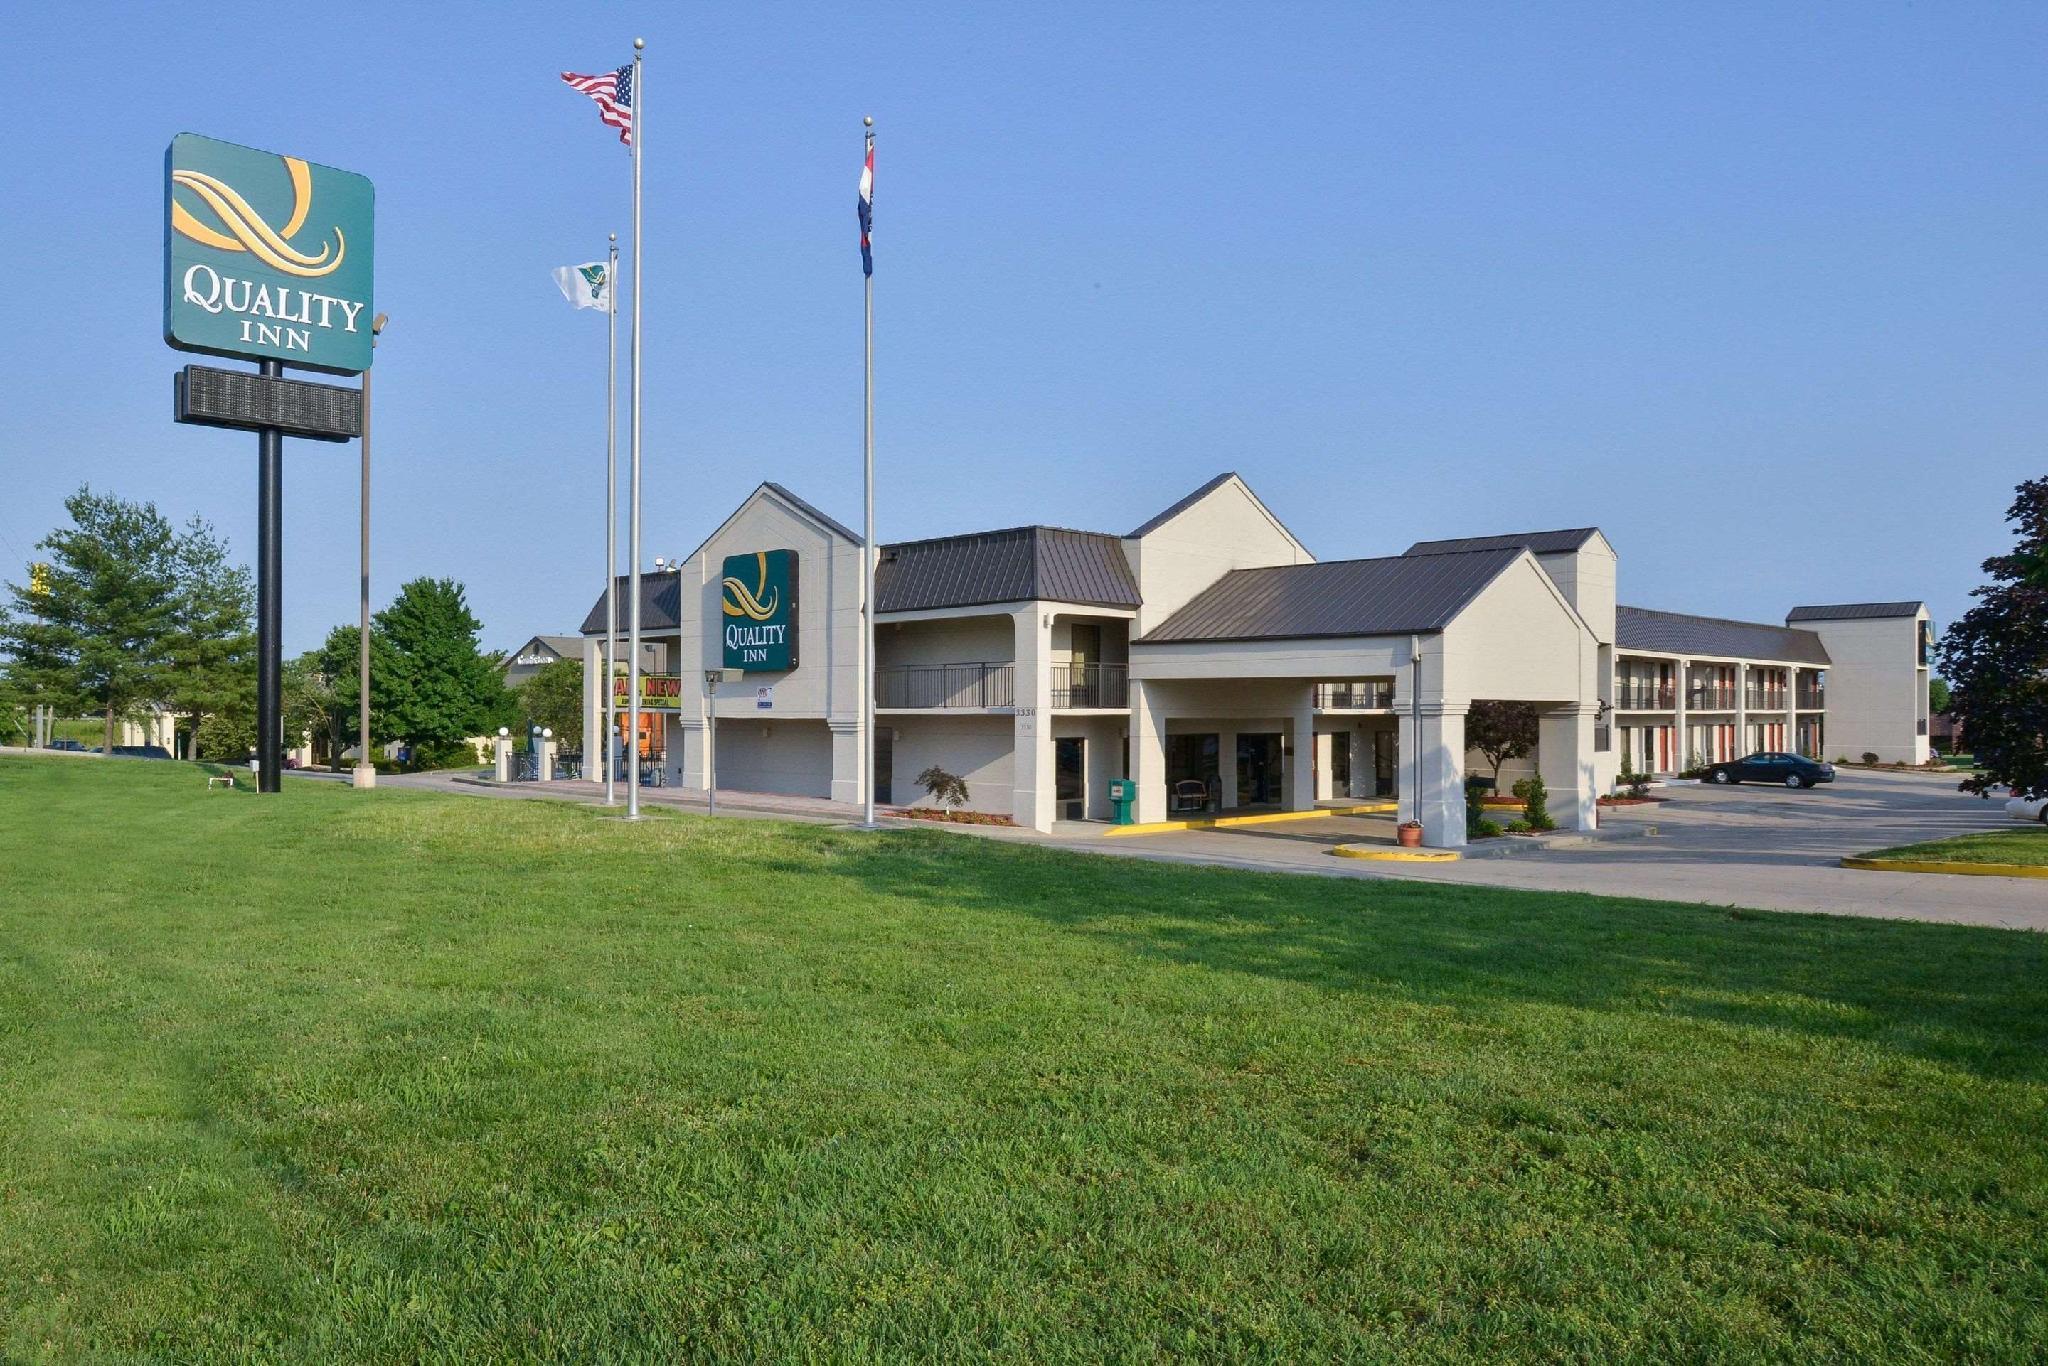 Quality Inn US65 And E Battlefield Rd Springfield